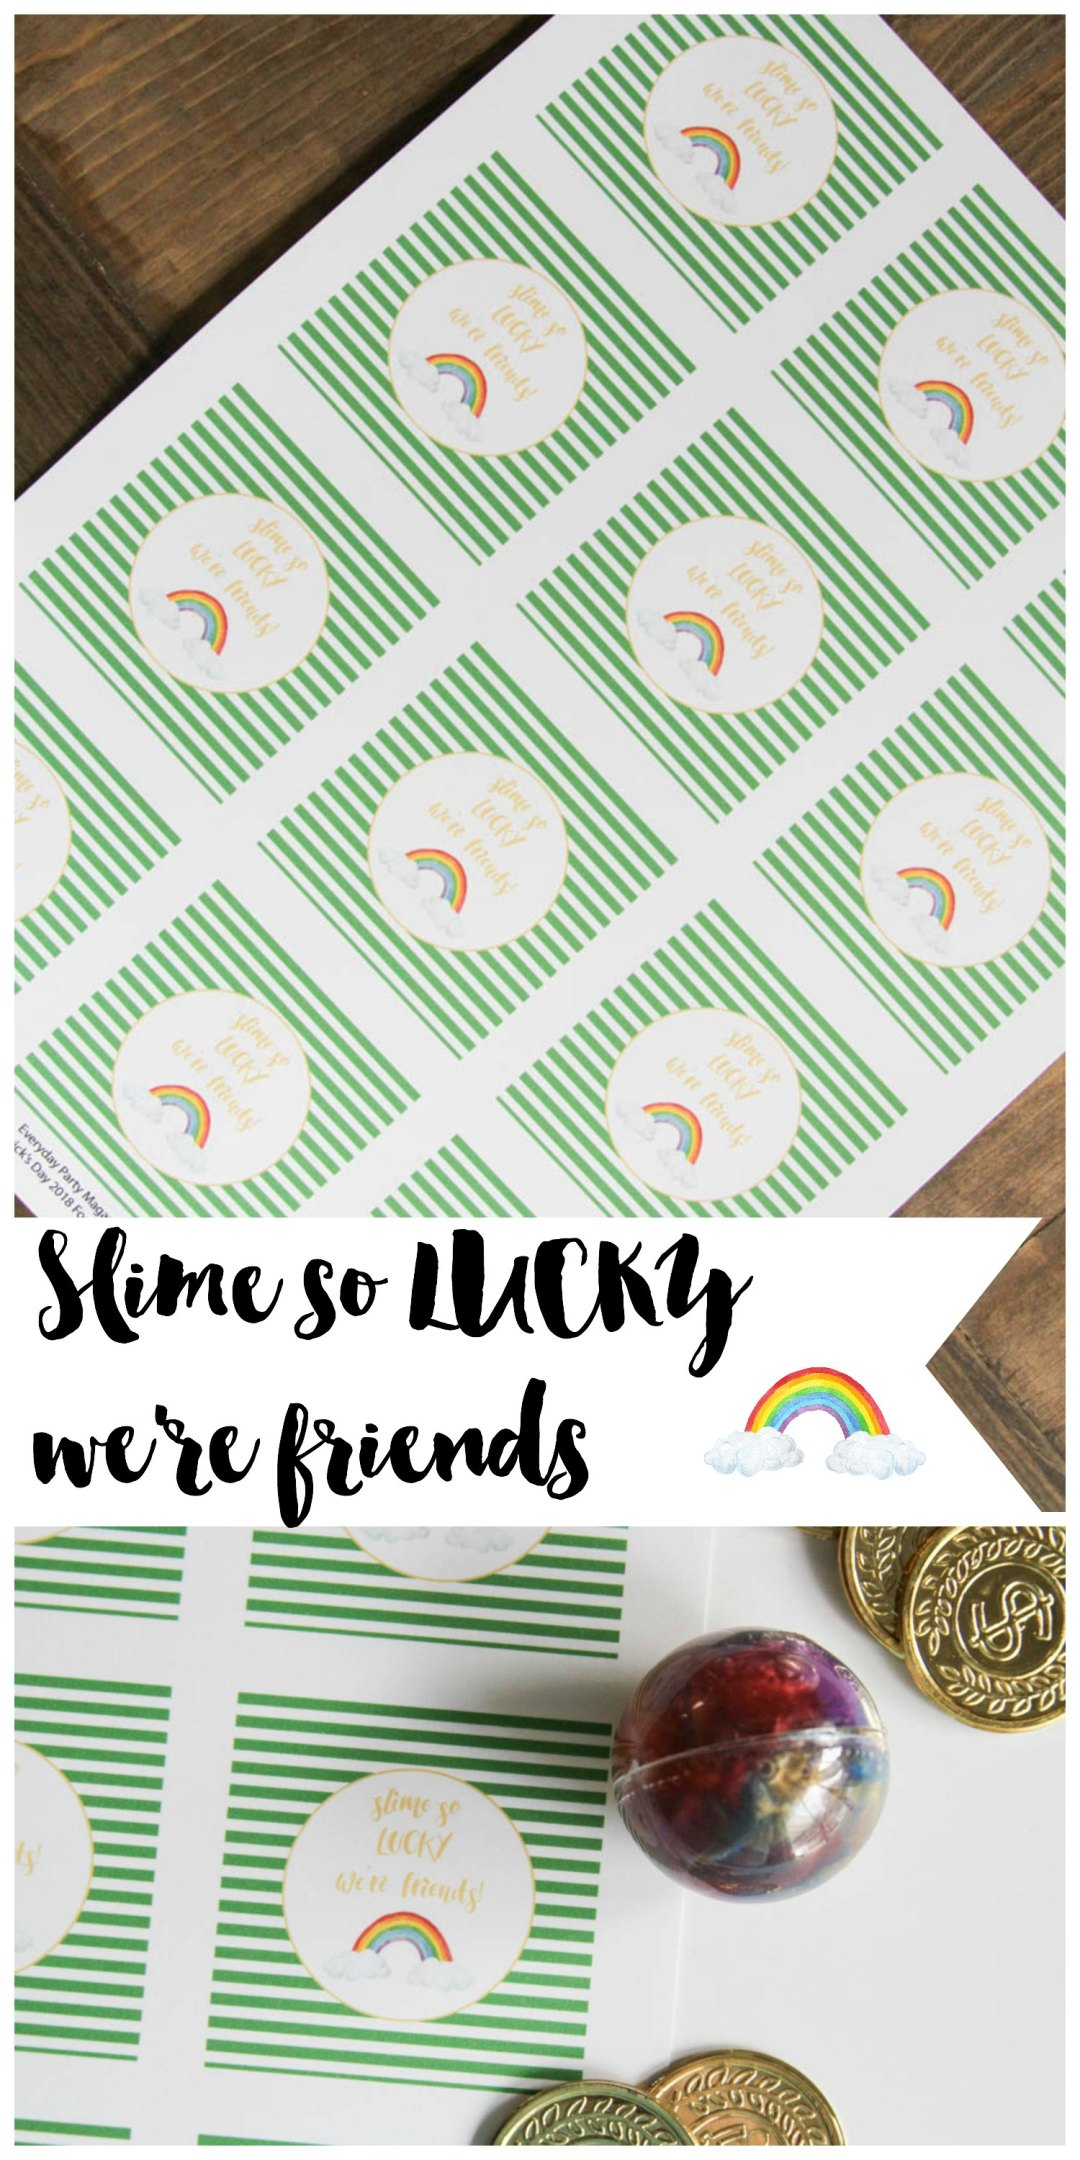 Everyday Party Magazine Slime So Lucky We're Friends #Slime #StPatricksDay #StPatsTreats